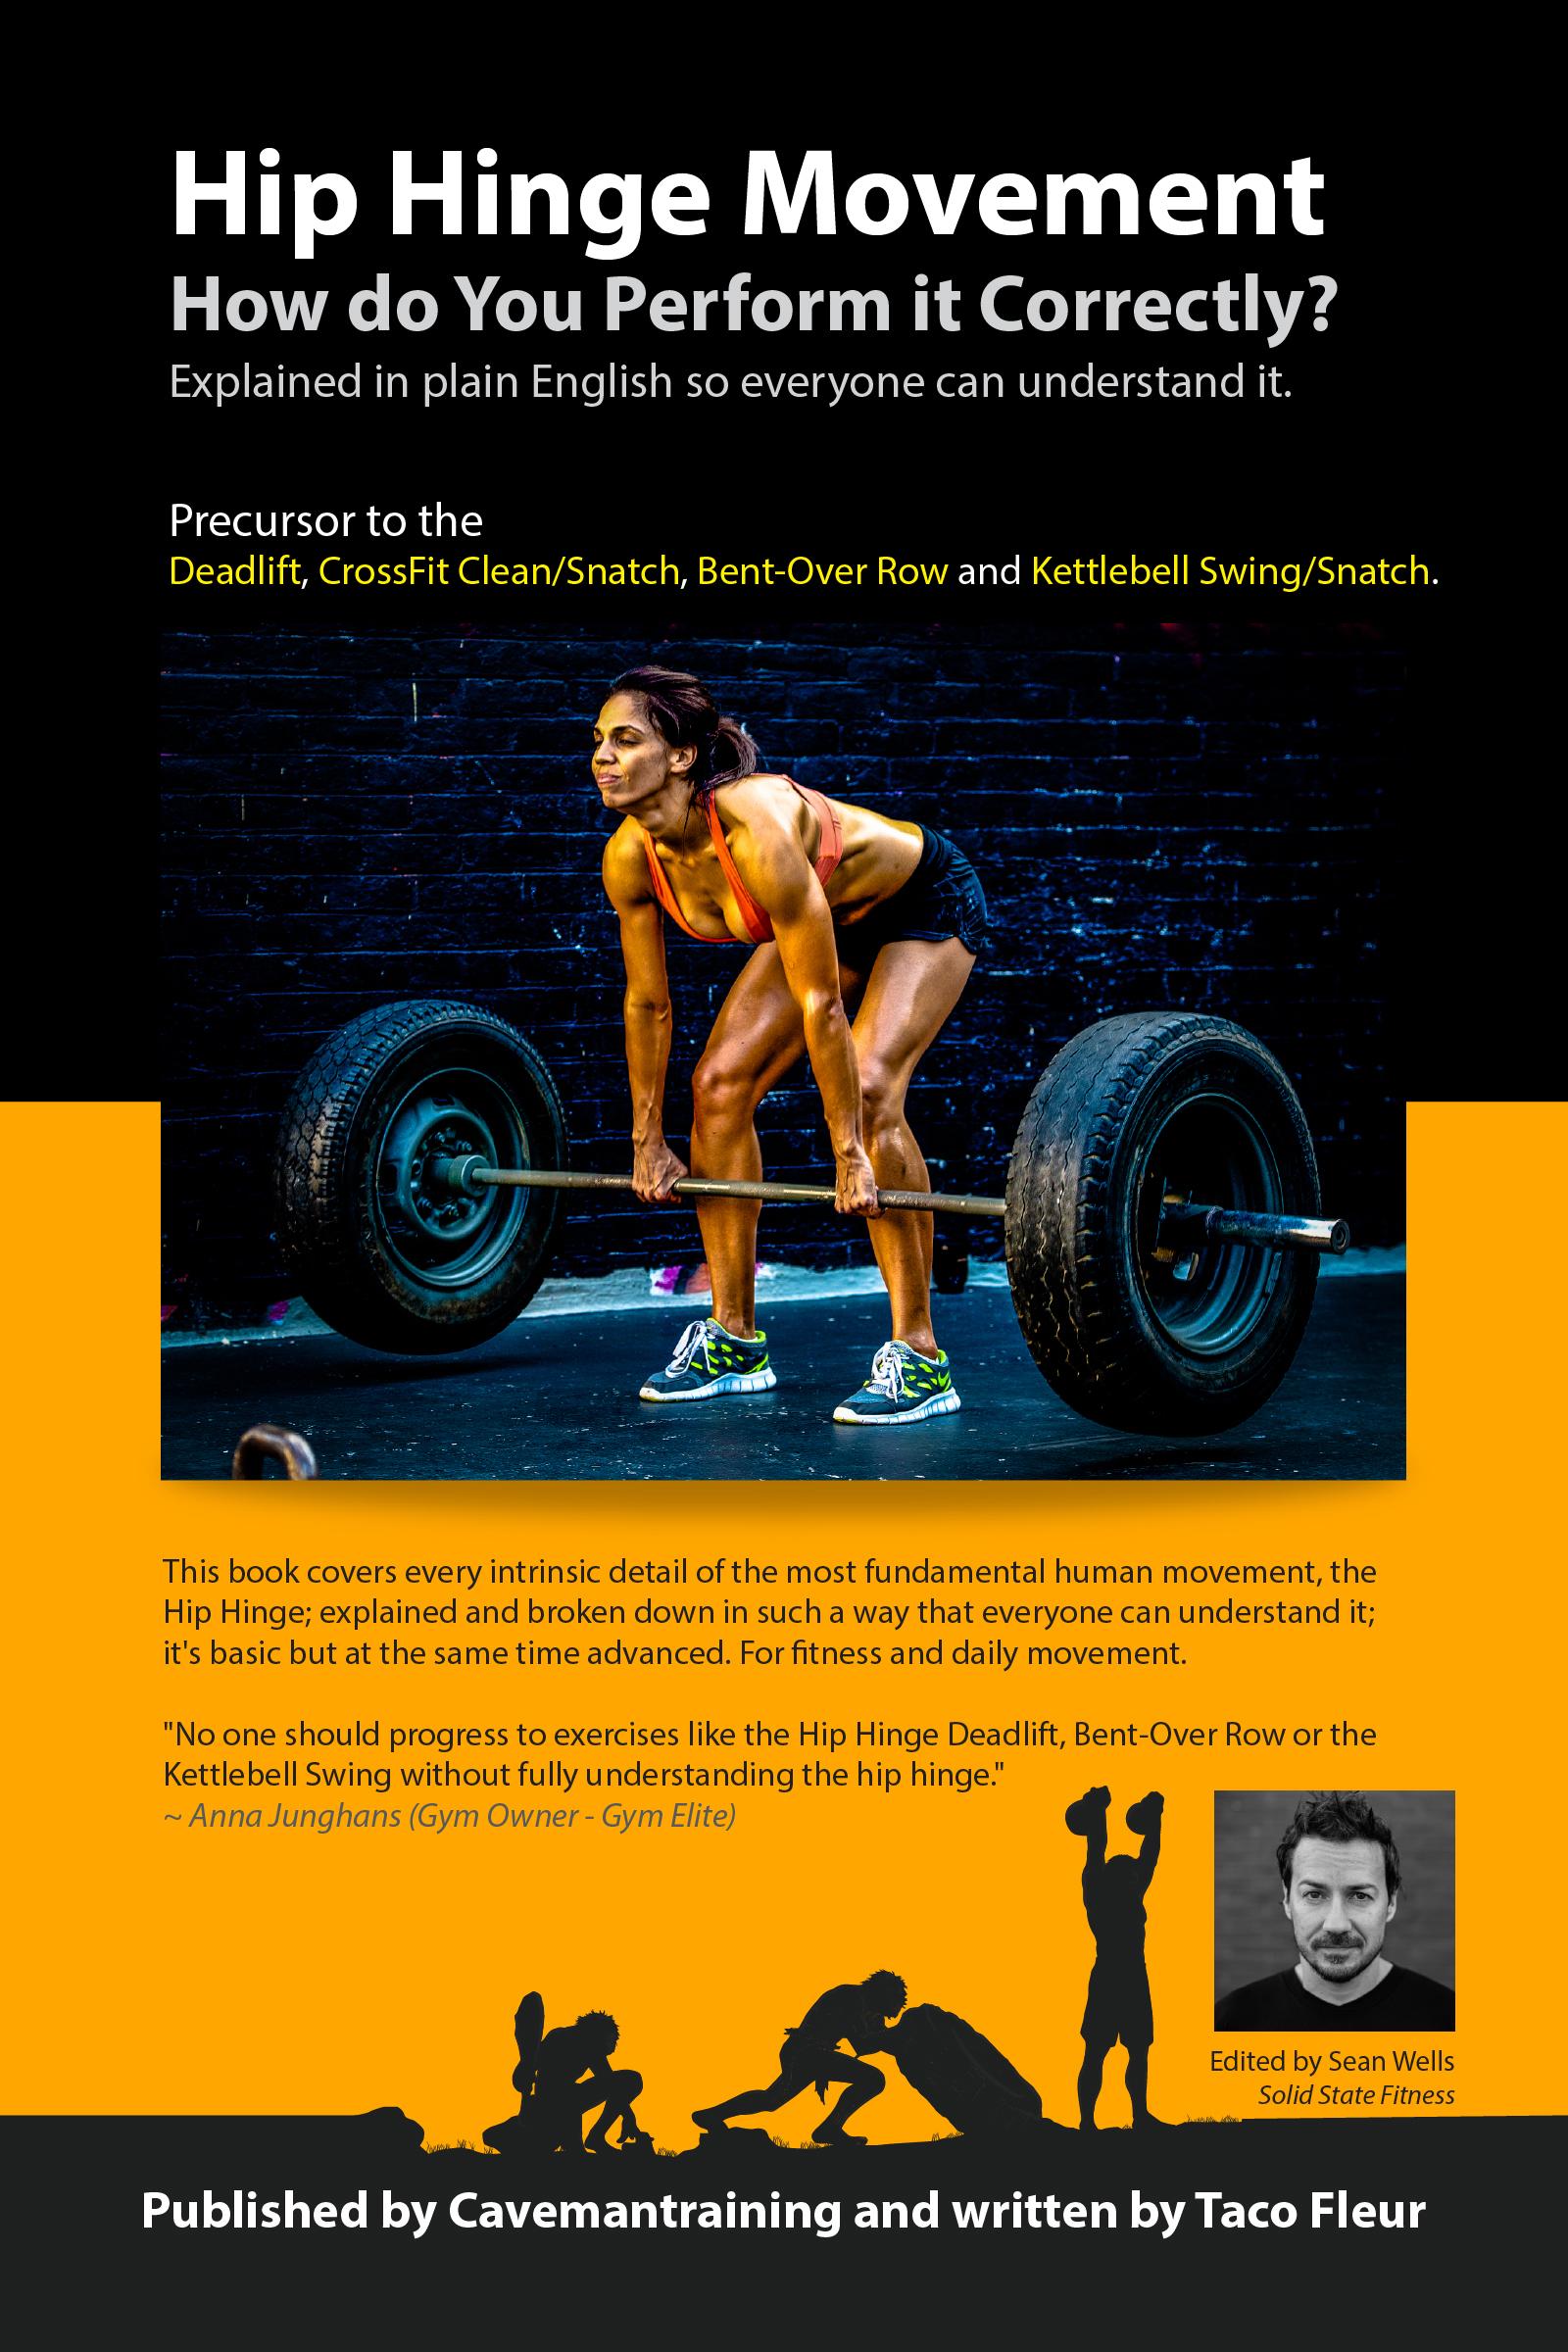 understanding the basic fundamentals of fitness